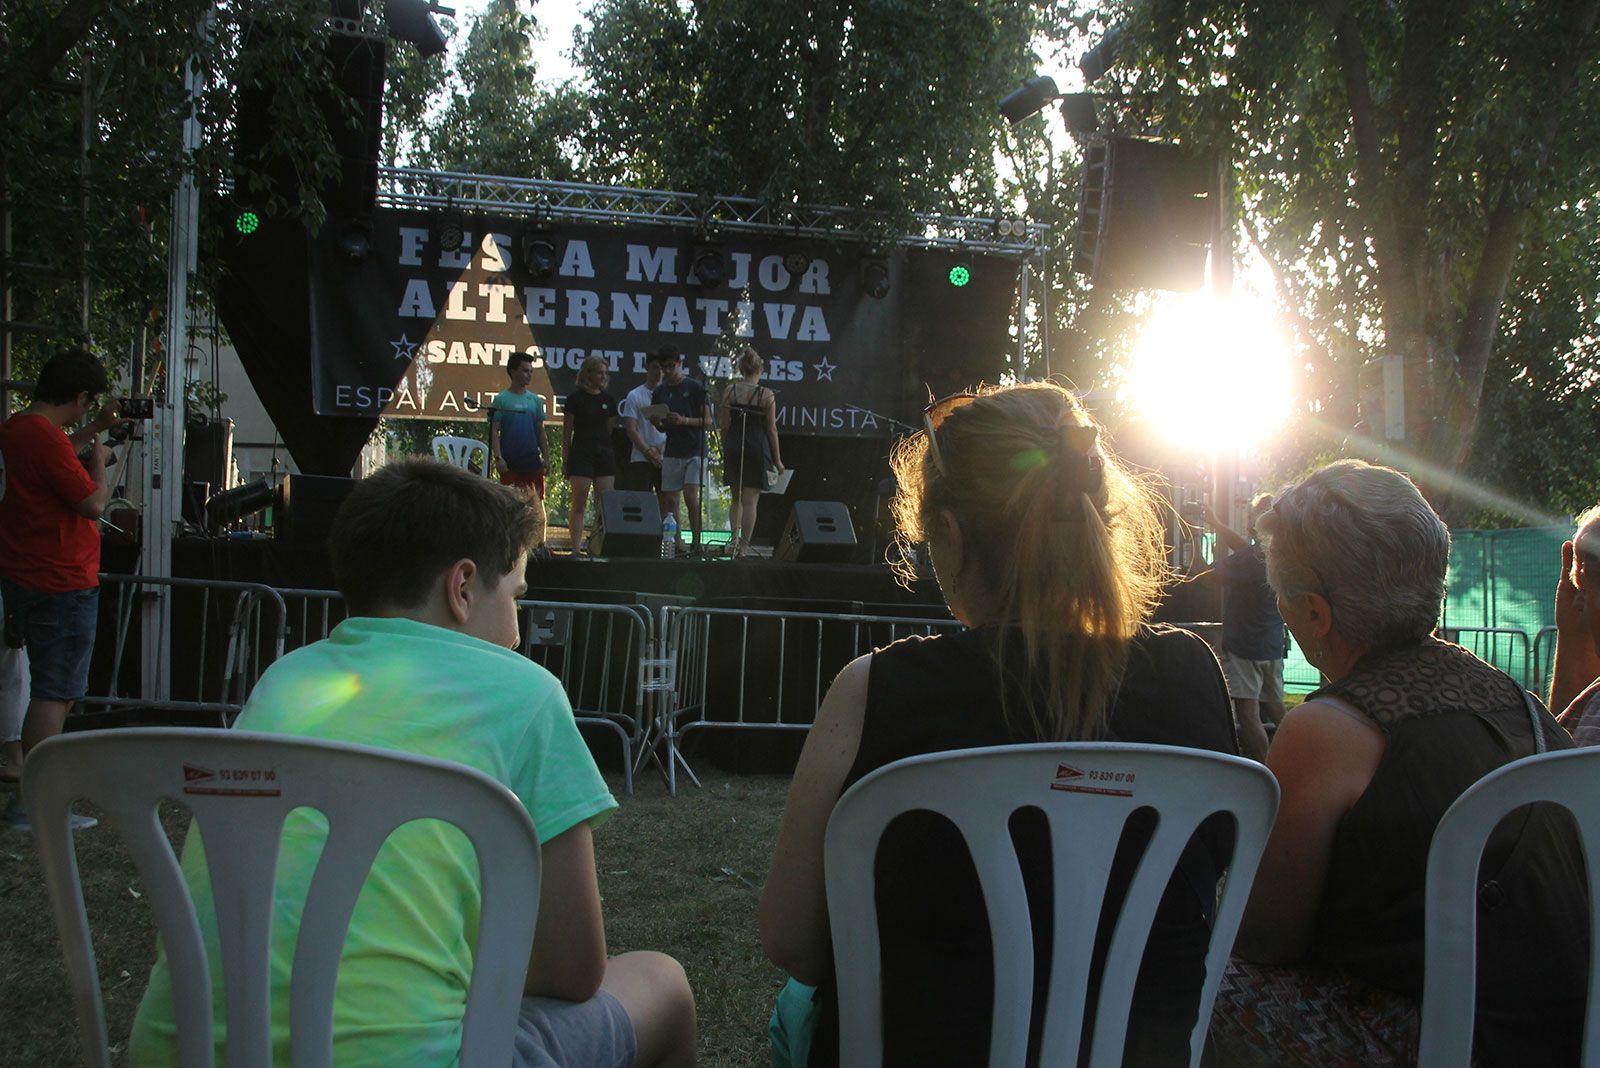 Pregó d'inici de la Festa Major Alternativa. FOTO: Paula Galván